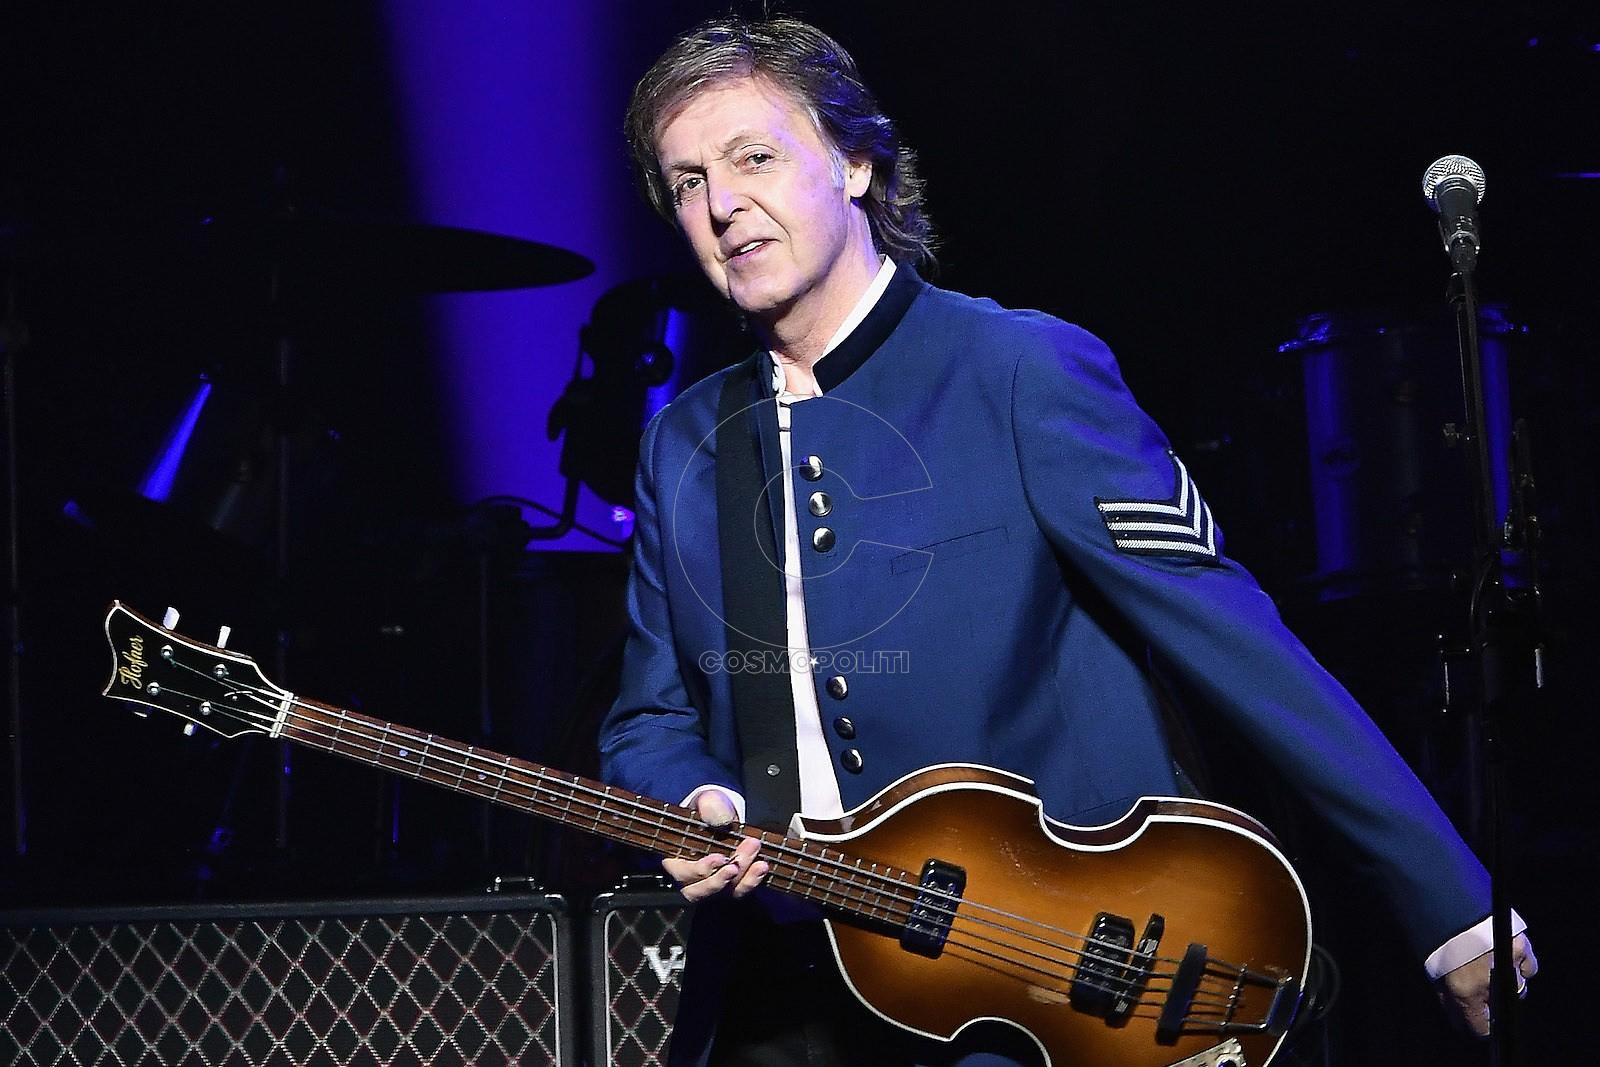 Paul-McCartney-Gustavo-Caballero-Getty-Images